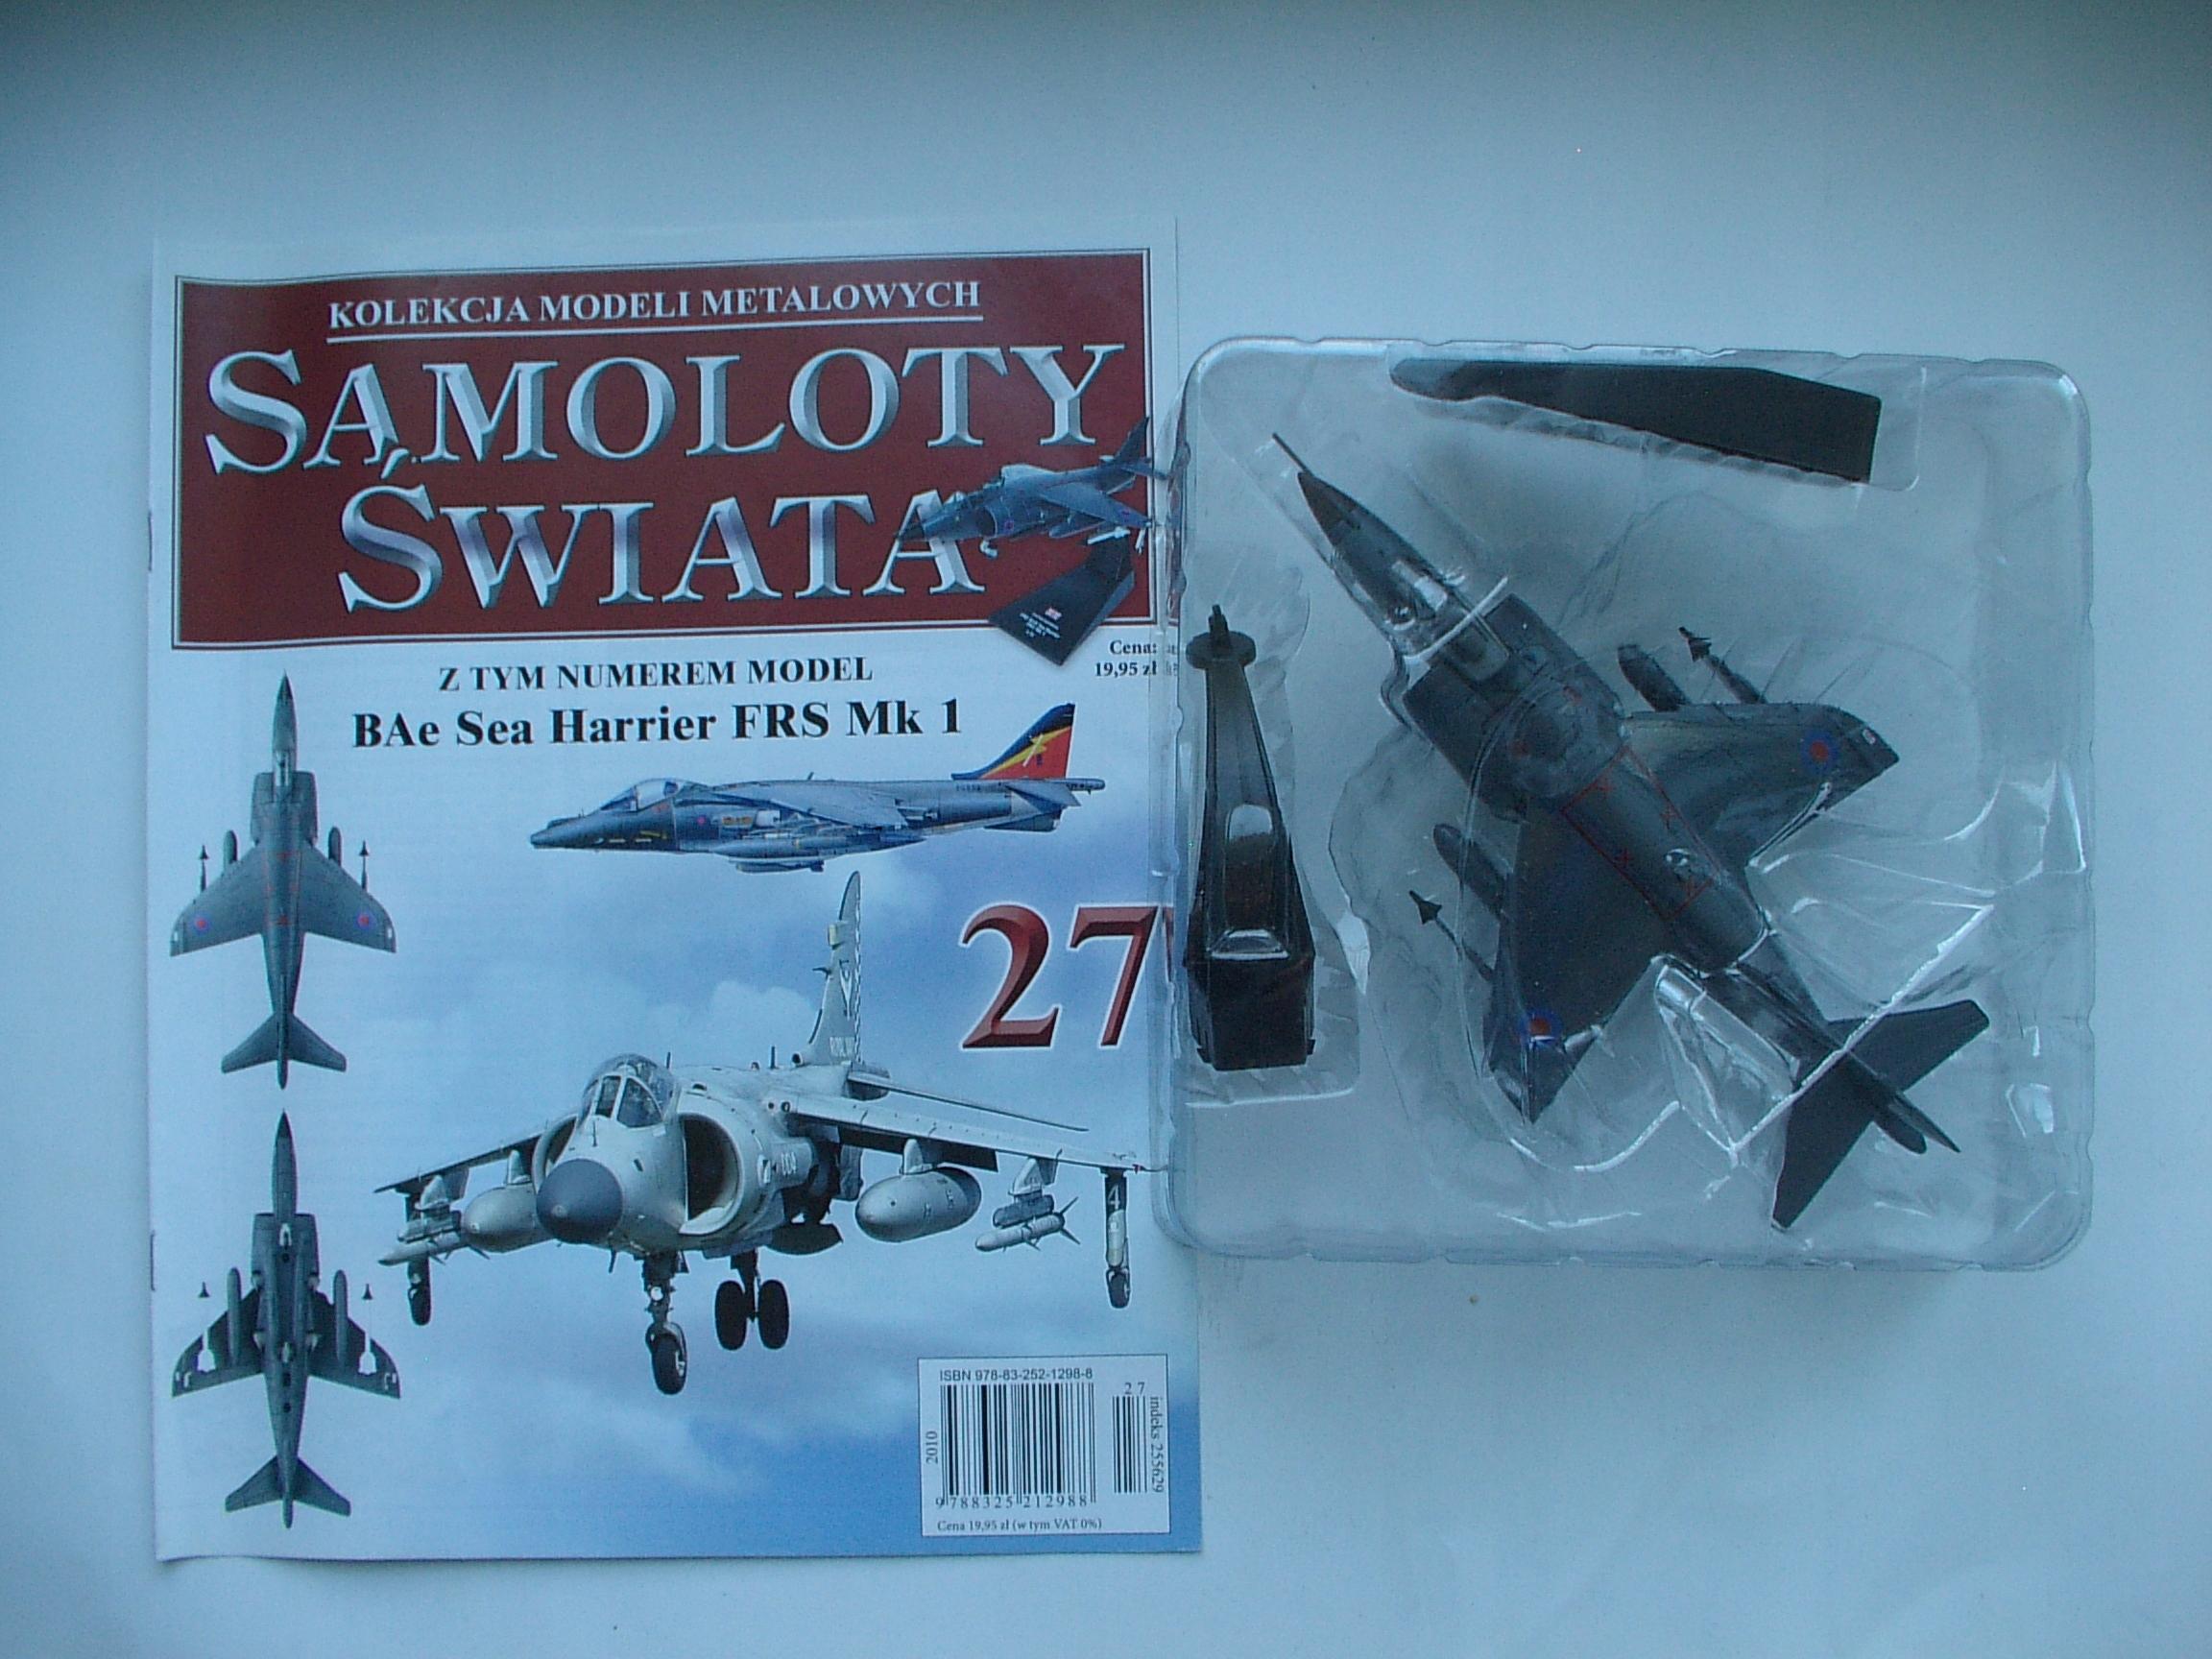 BAE sea Harrier FRS. Mk1 Samoloty Świata Nr 27